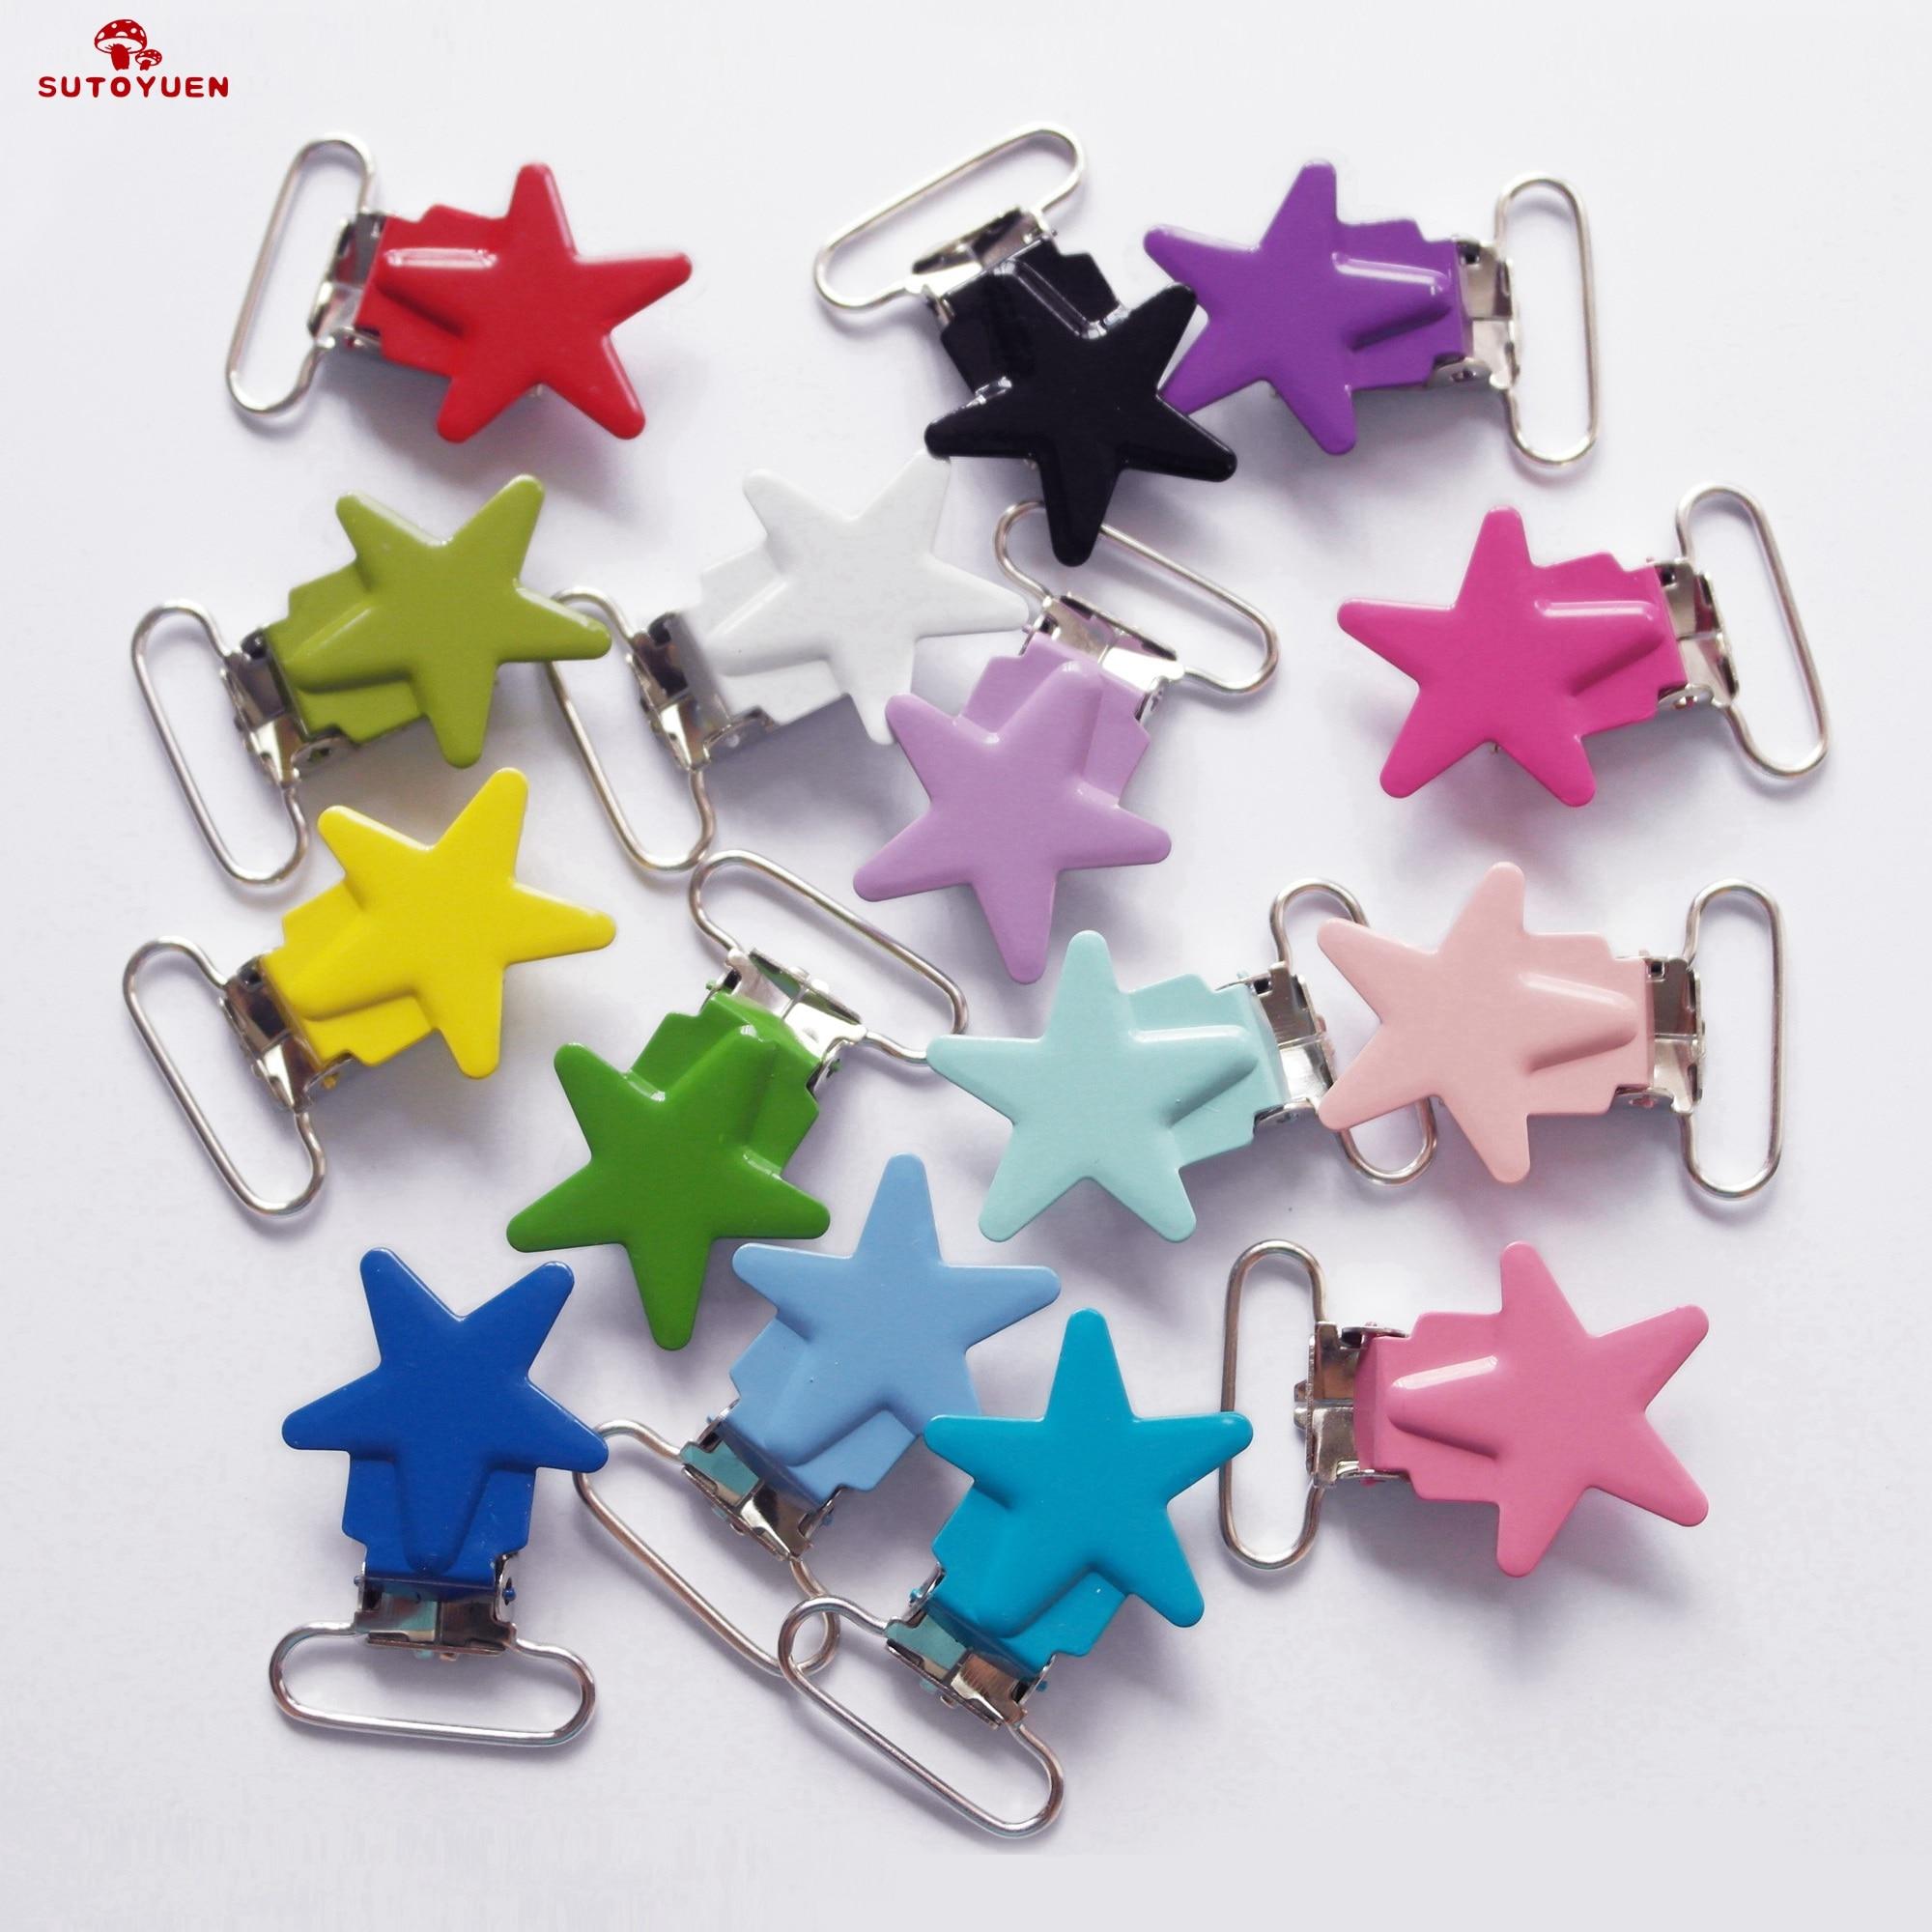 livre de chumbo 80 pces 1 25 25 25mm 16 cores esmalte estrela forma metal bebe